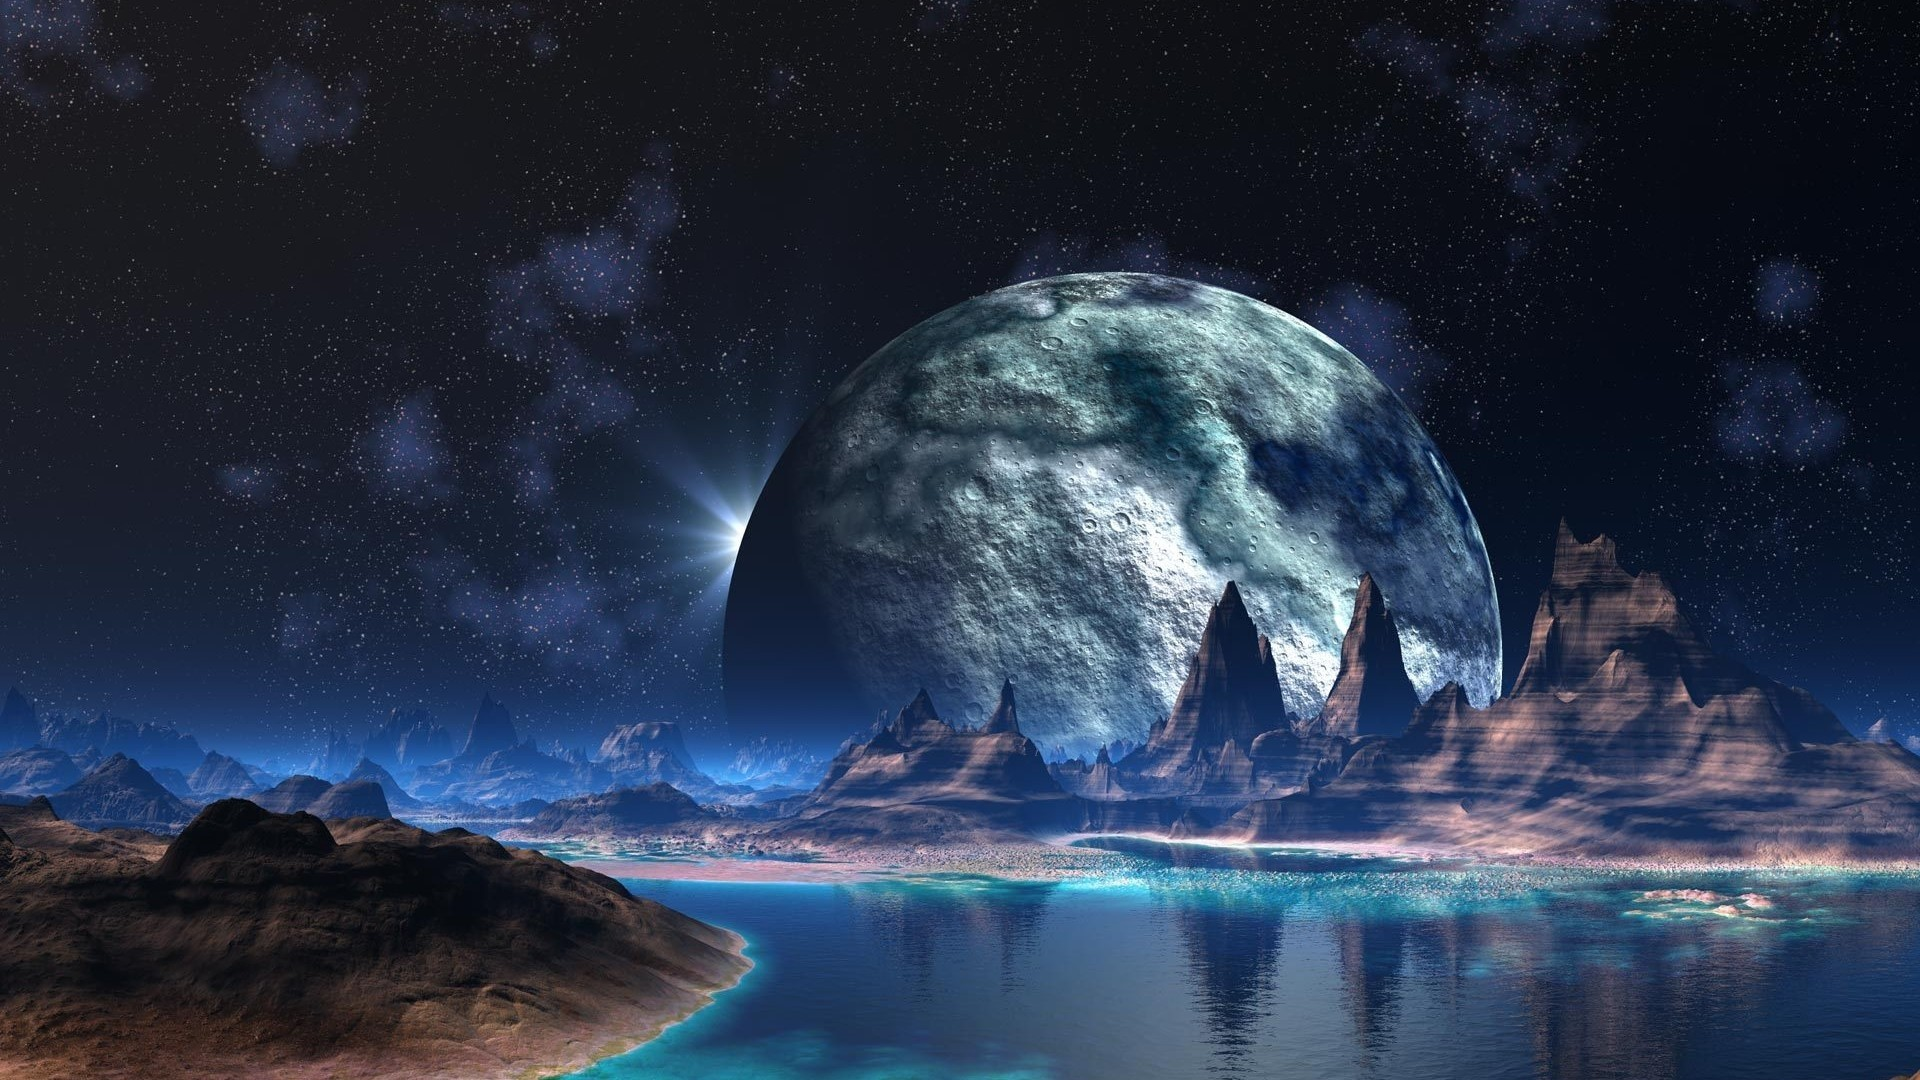 Alien World 3D Wallpaper – HQ Free Wallpapers download 100% high .